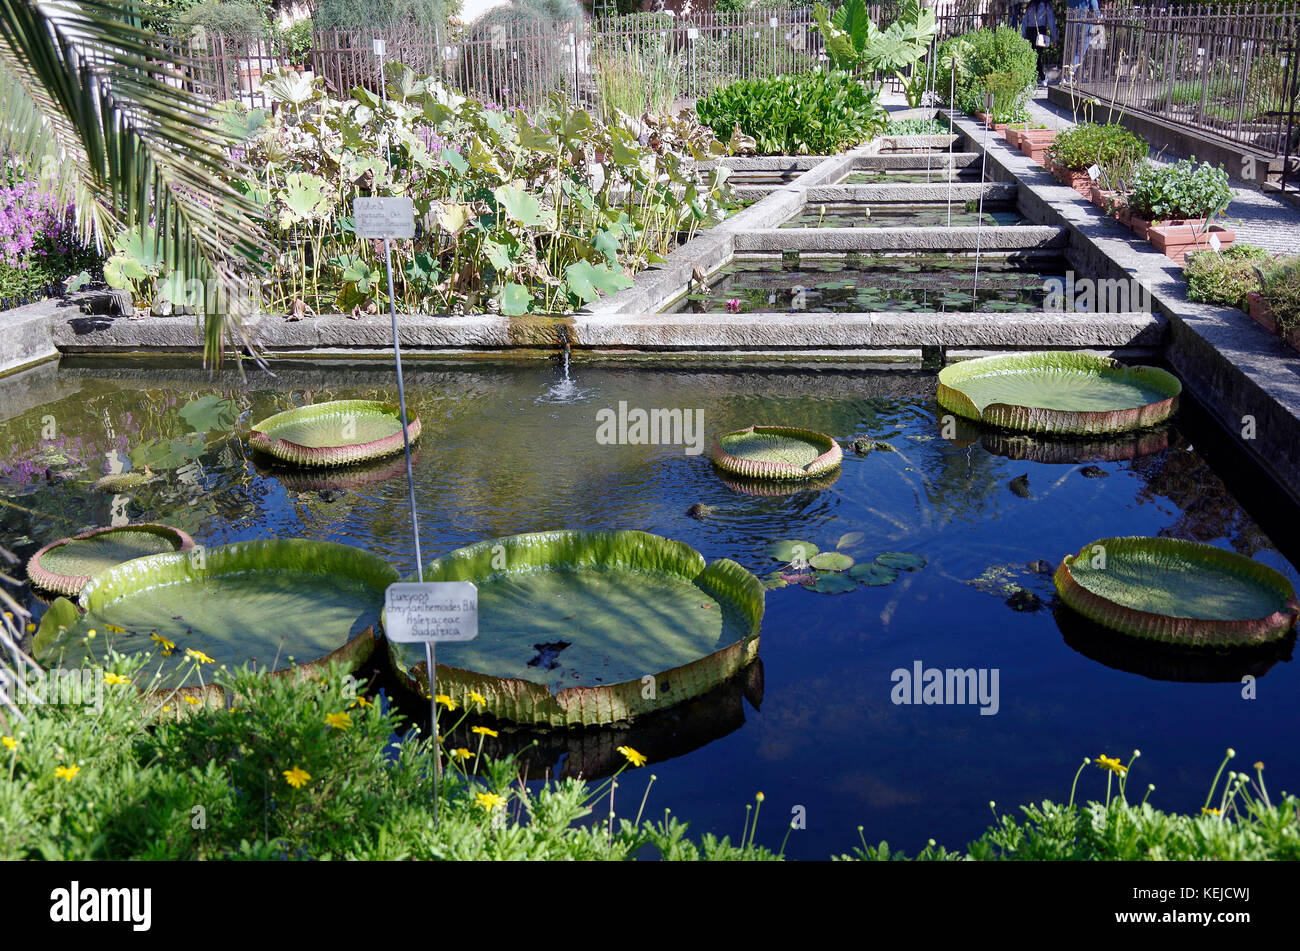 Orto botanico di padova padua botanical garden the world s